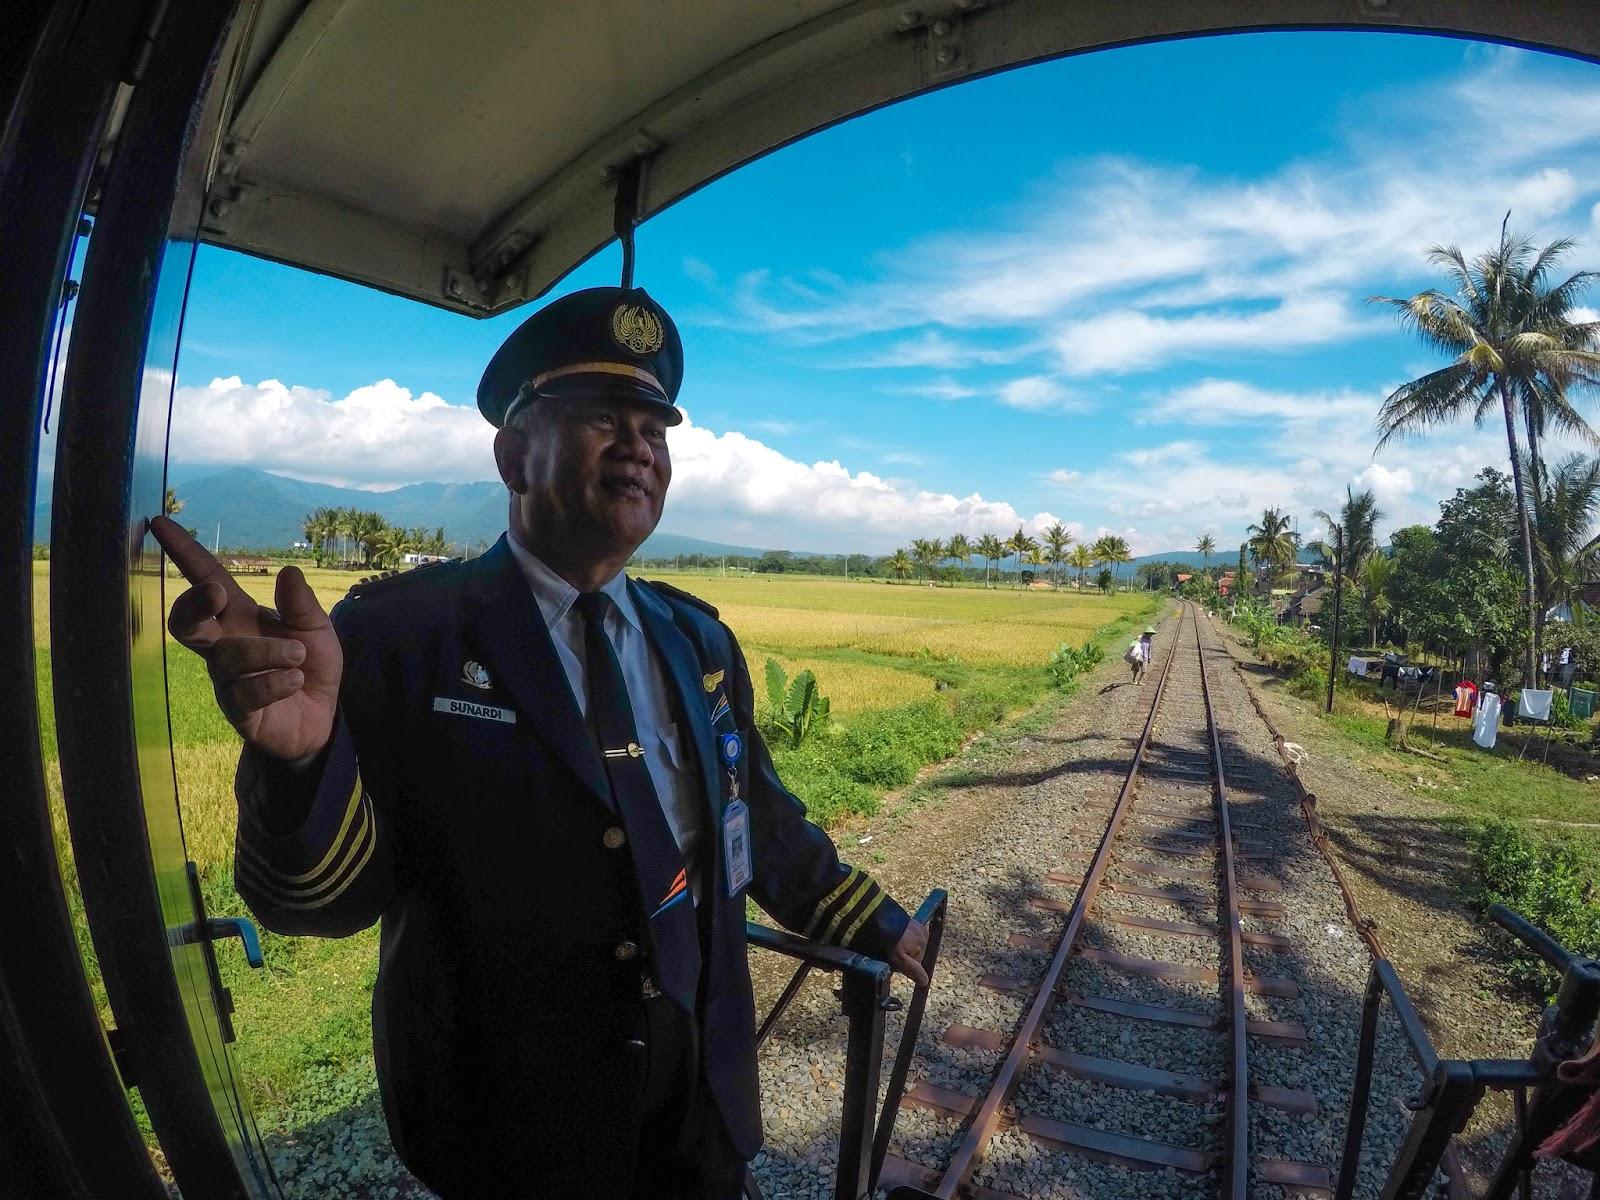 69 Pesona Wisata Kabupaten Semarang Smartphonegraphers Edukasi Selanjutnya Museum Kereta